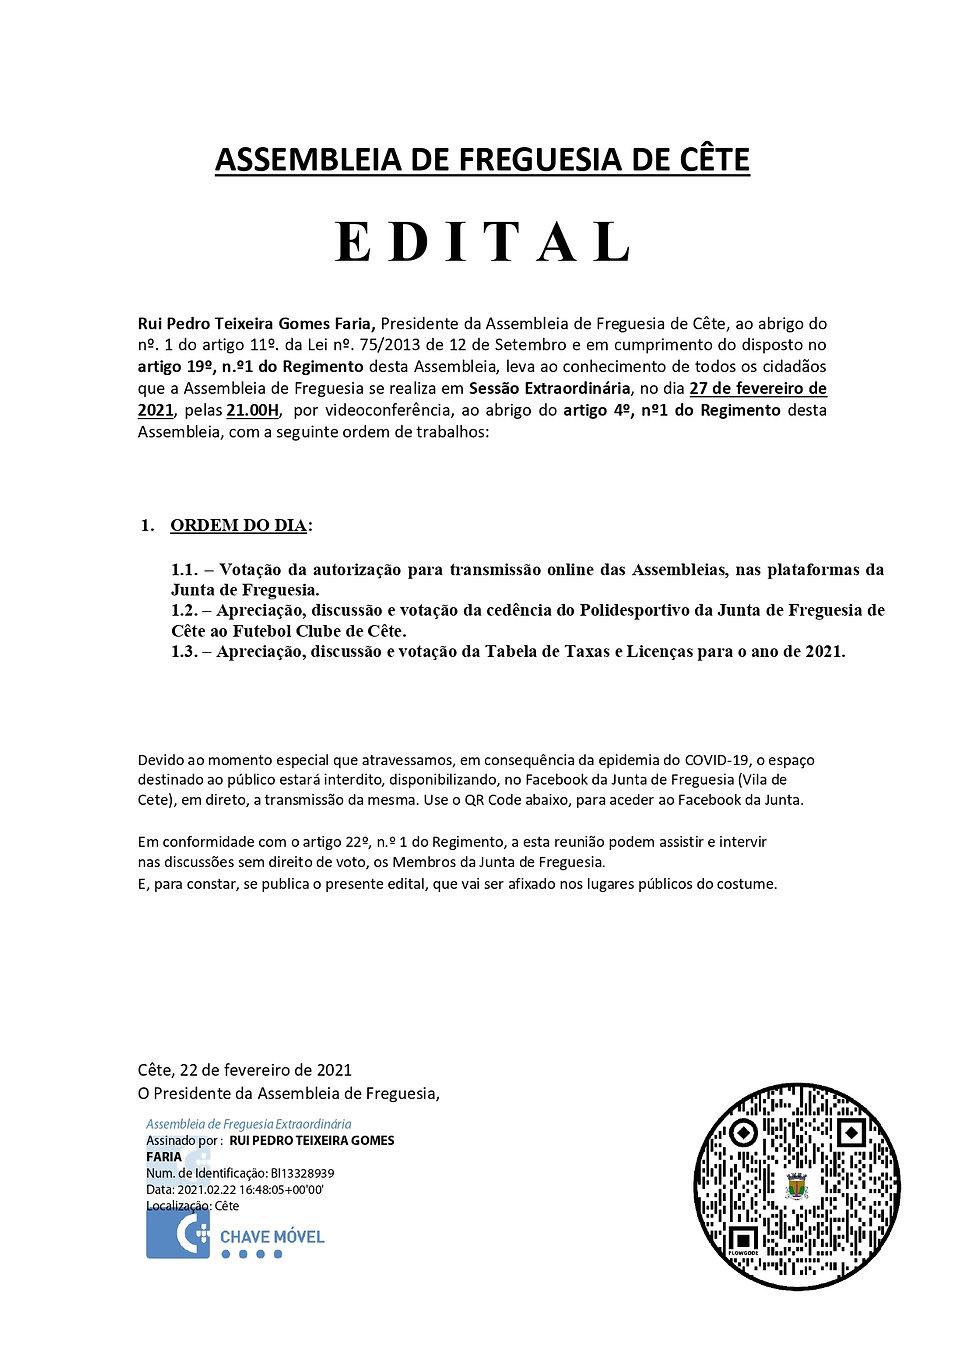 EDITAL 27-02-2021_signed.jpg